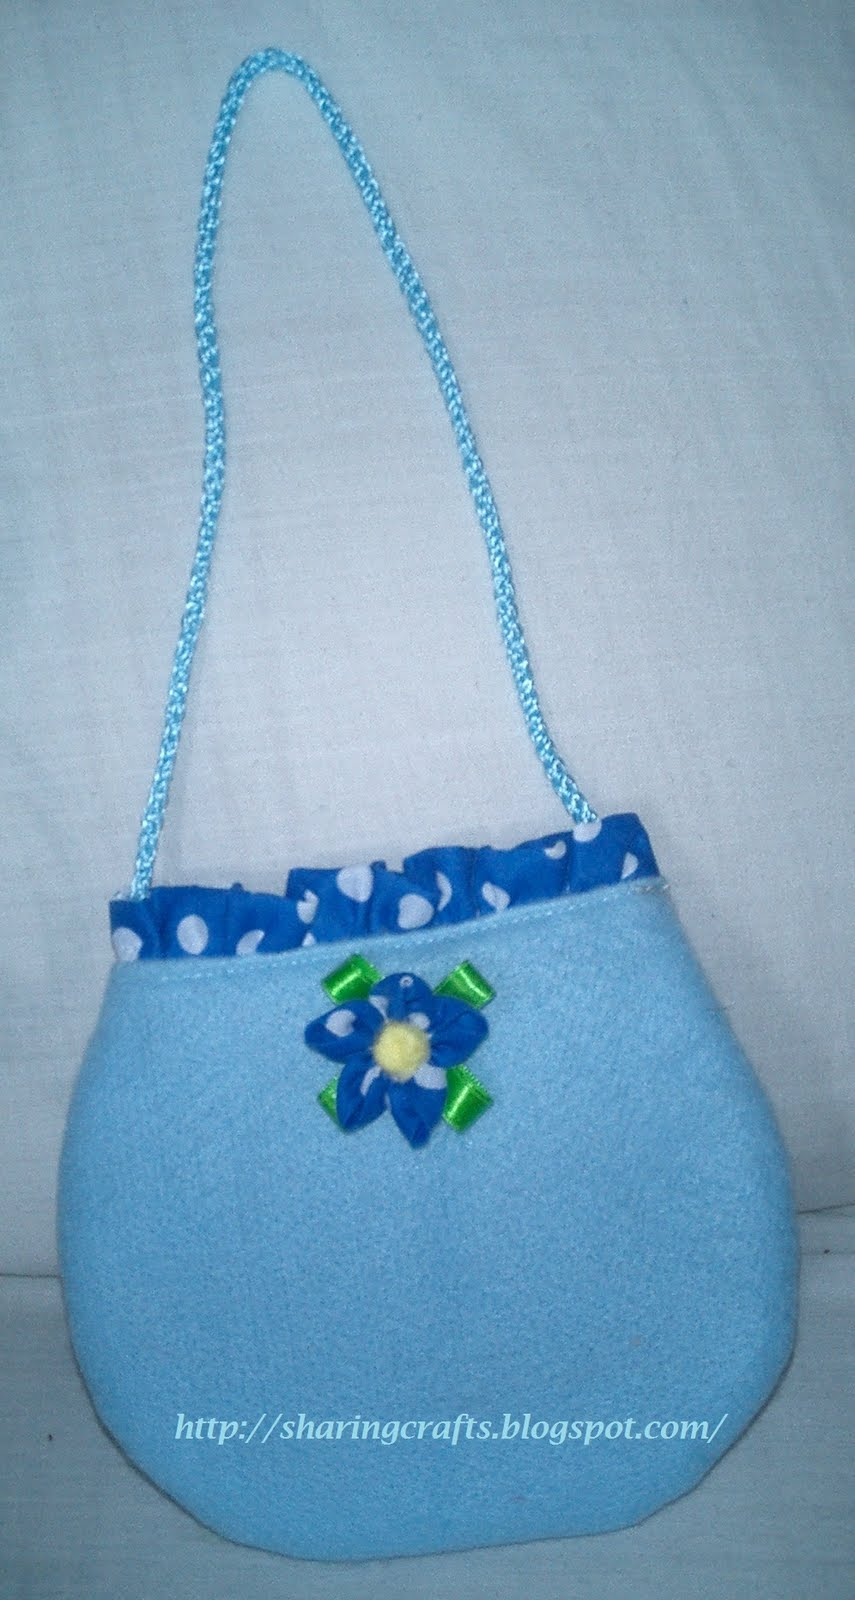 Maestra neila como hacer un bolso de fieltro - Bolsos para hacer ...